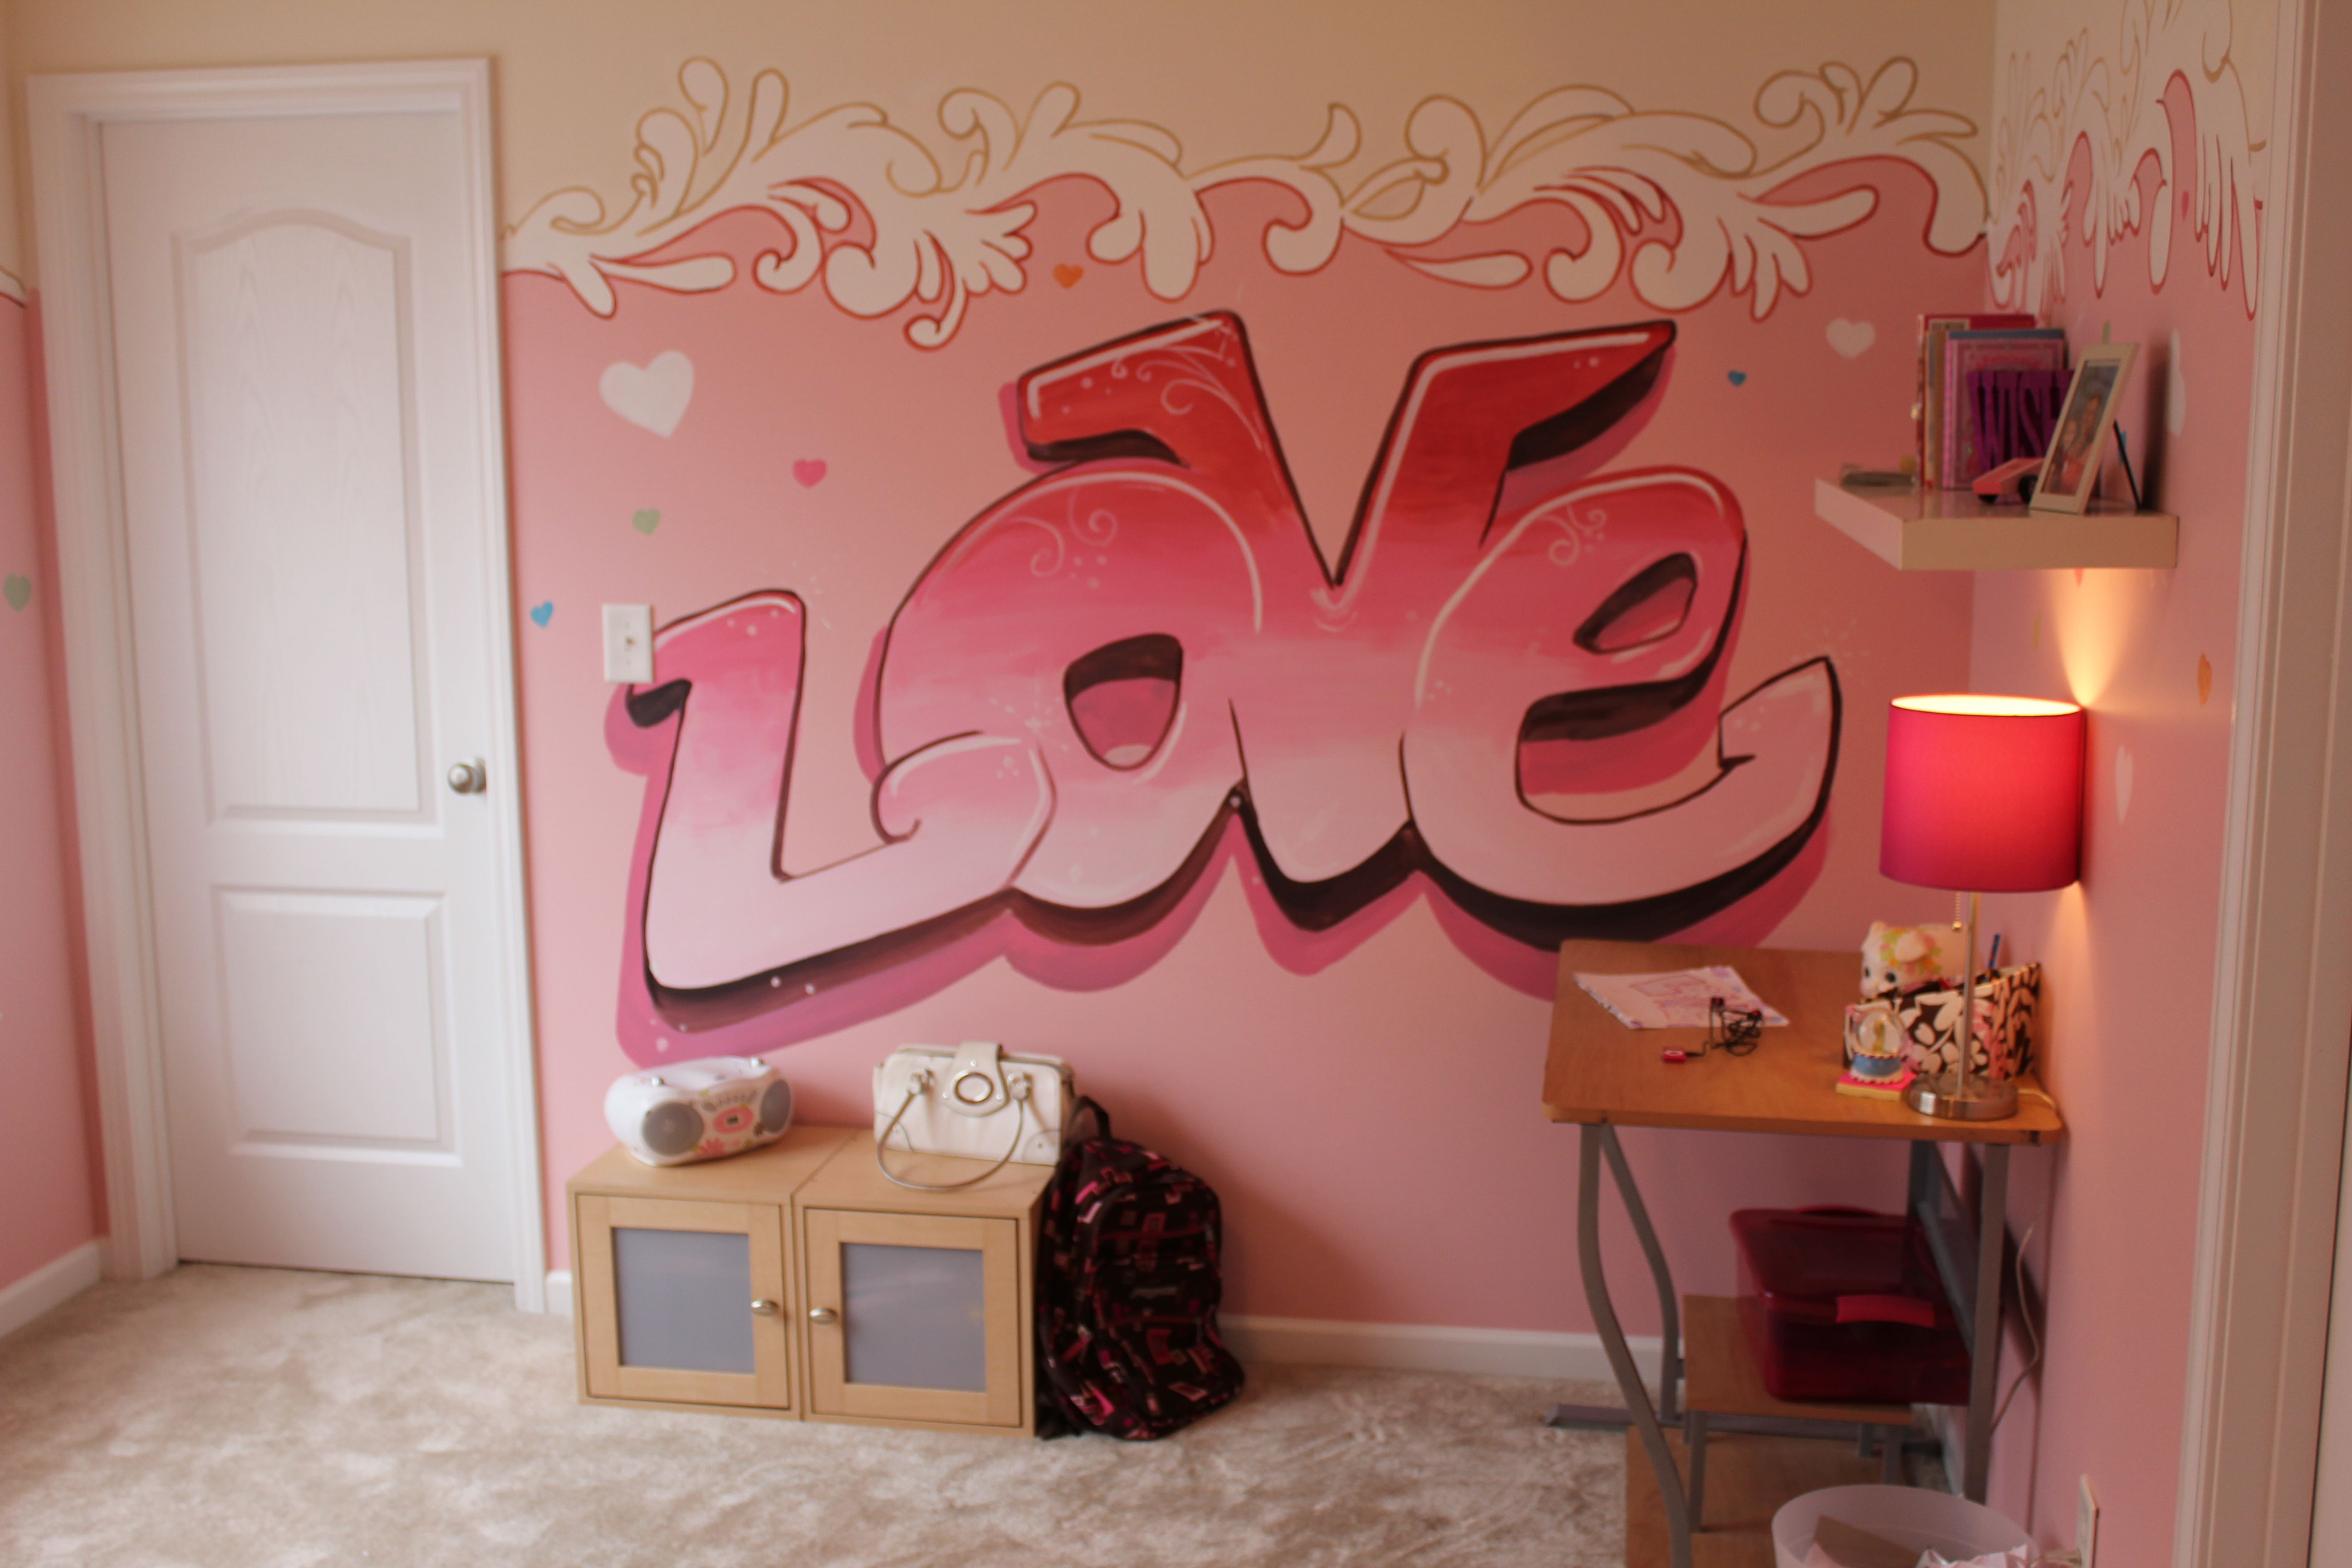 Graffiti Murals for Bedrooms Girls